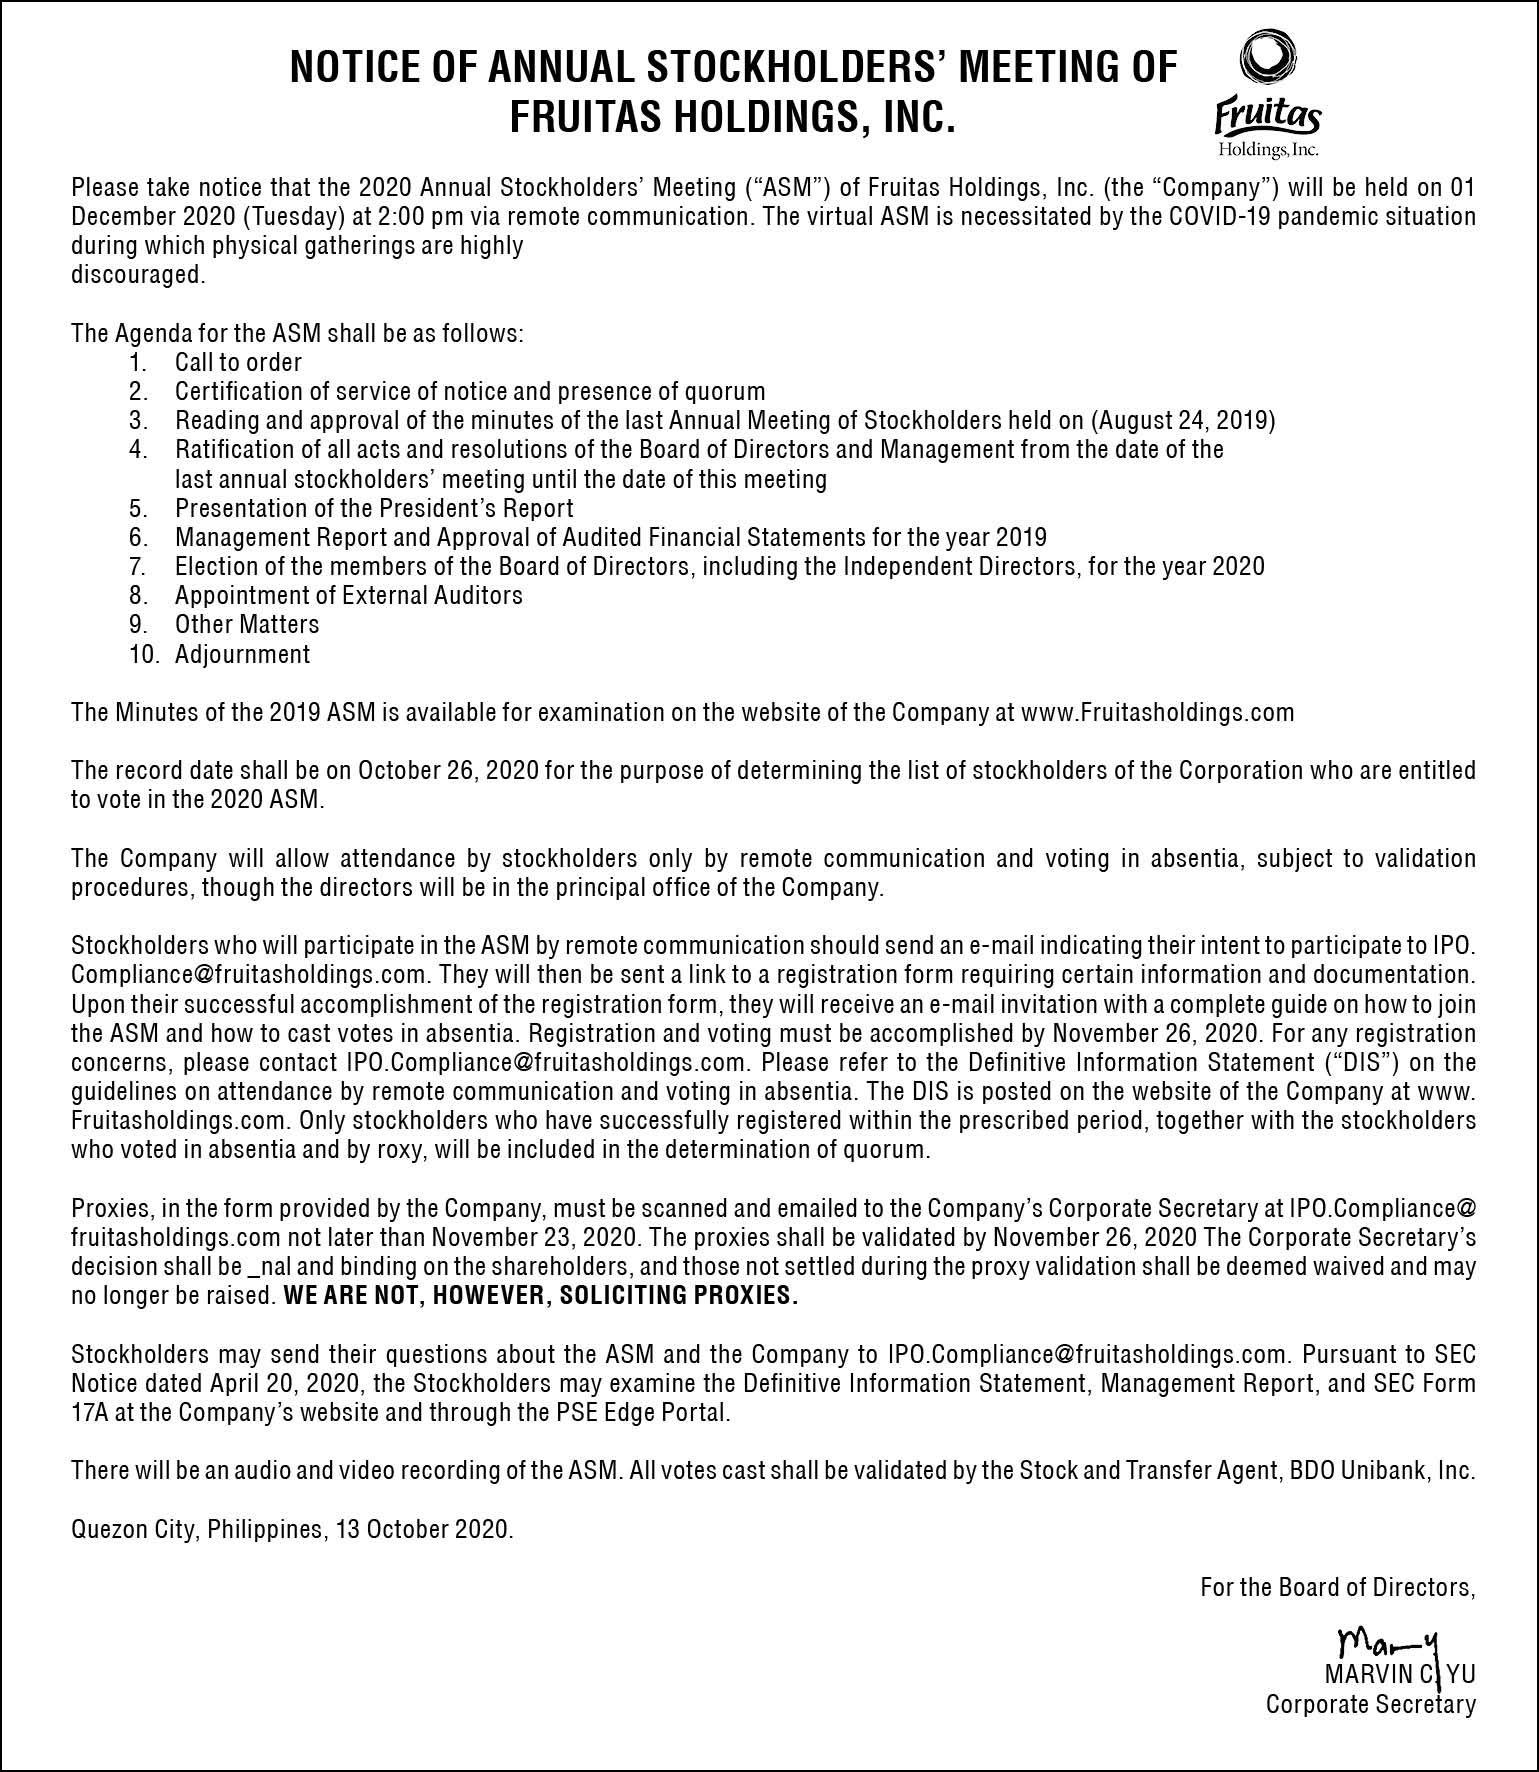 Fruitas Notice 4x15 1 - Fruitas Holdings, Inc. announces schedule of annual stockholders' meeting via remote communication